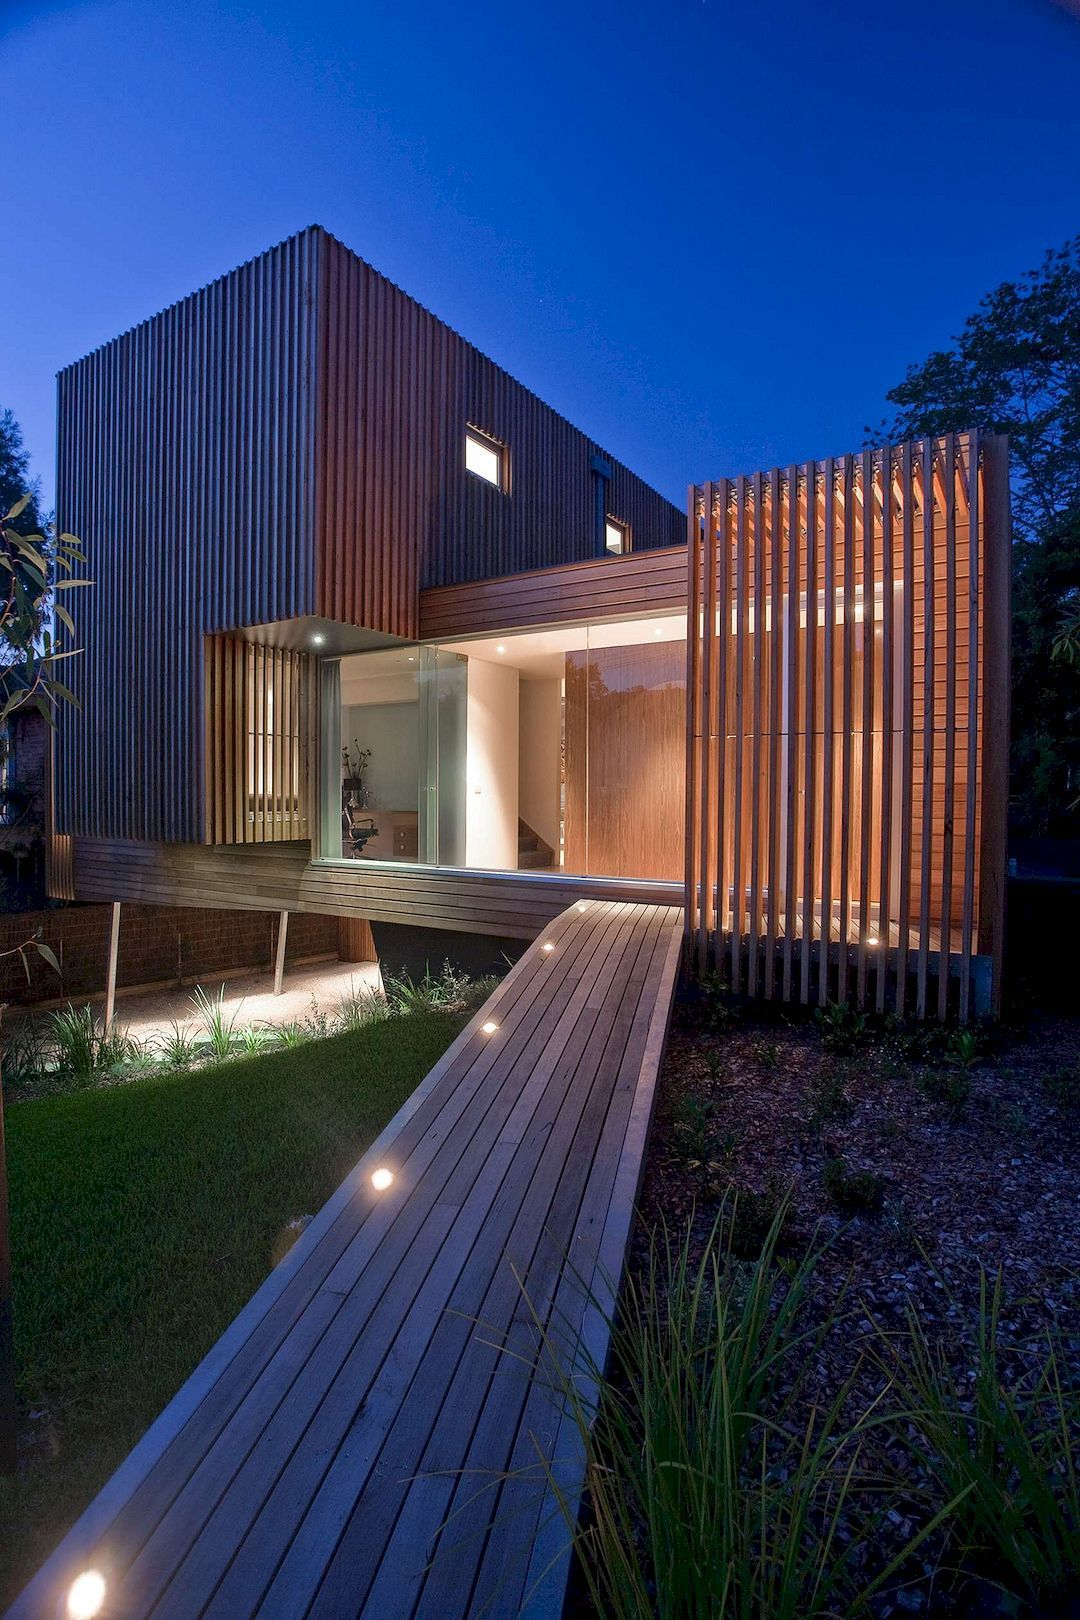 Bon House Design Inspiration: 115 Fantastic Modern Styles